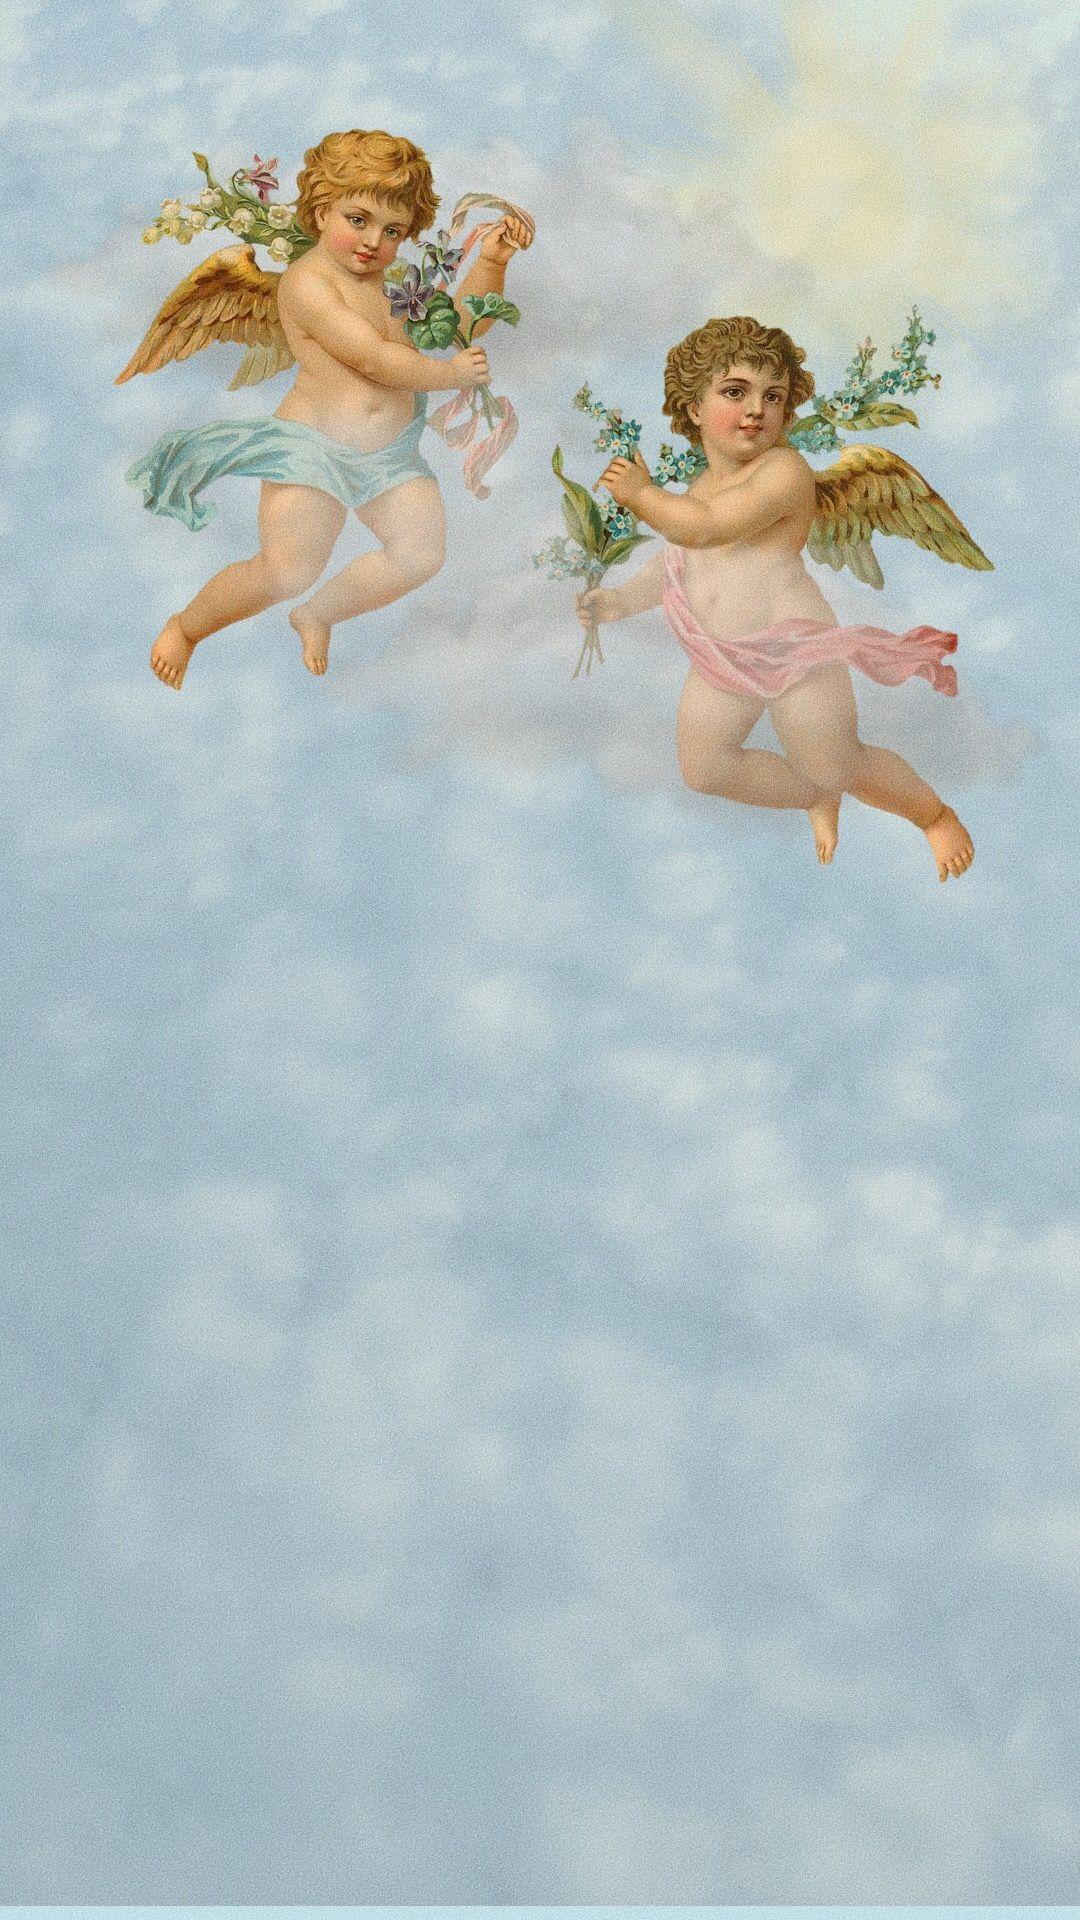 clouds cherubs wallpaper with Sunny VSCO filter Cherub art 1080x1920